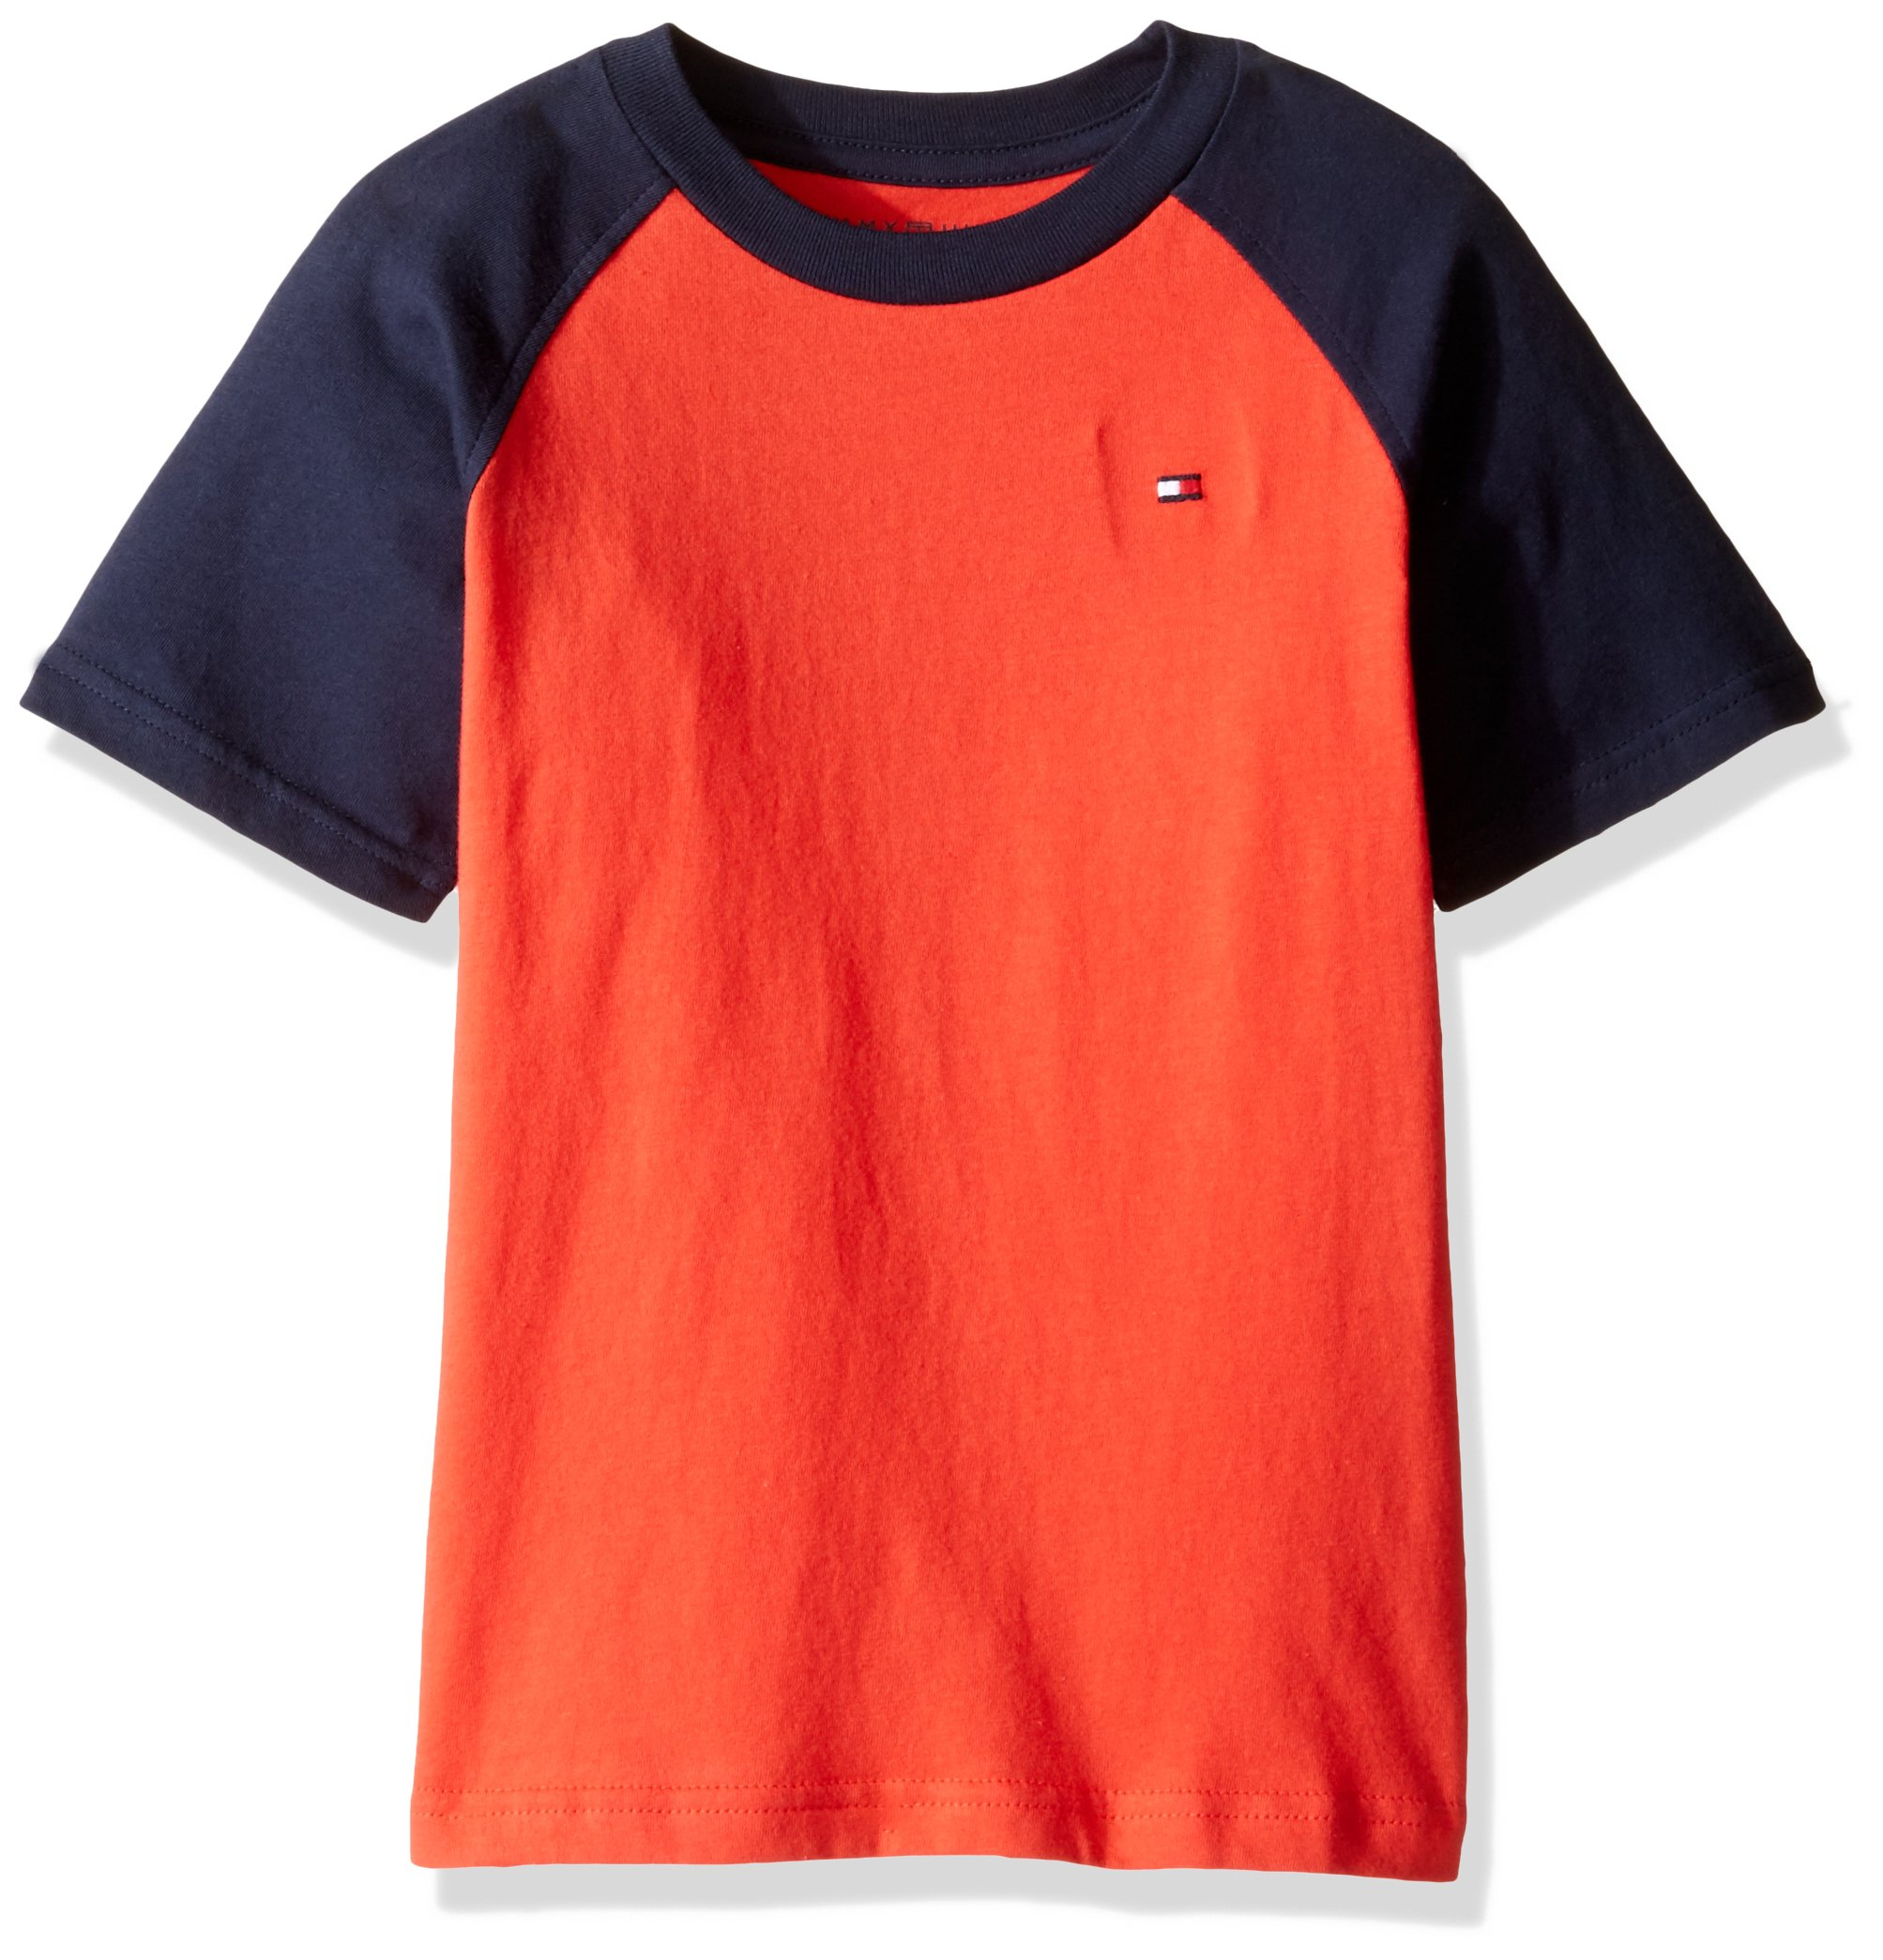 99e1de10 Galleon - Tommy Hilfiger Boys' Little Short Sleeve Raglan T-Shirt, Holly Red  Large/6